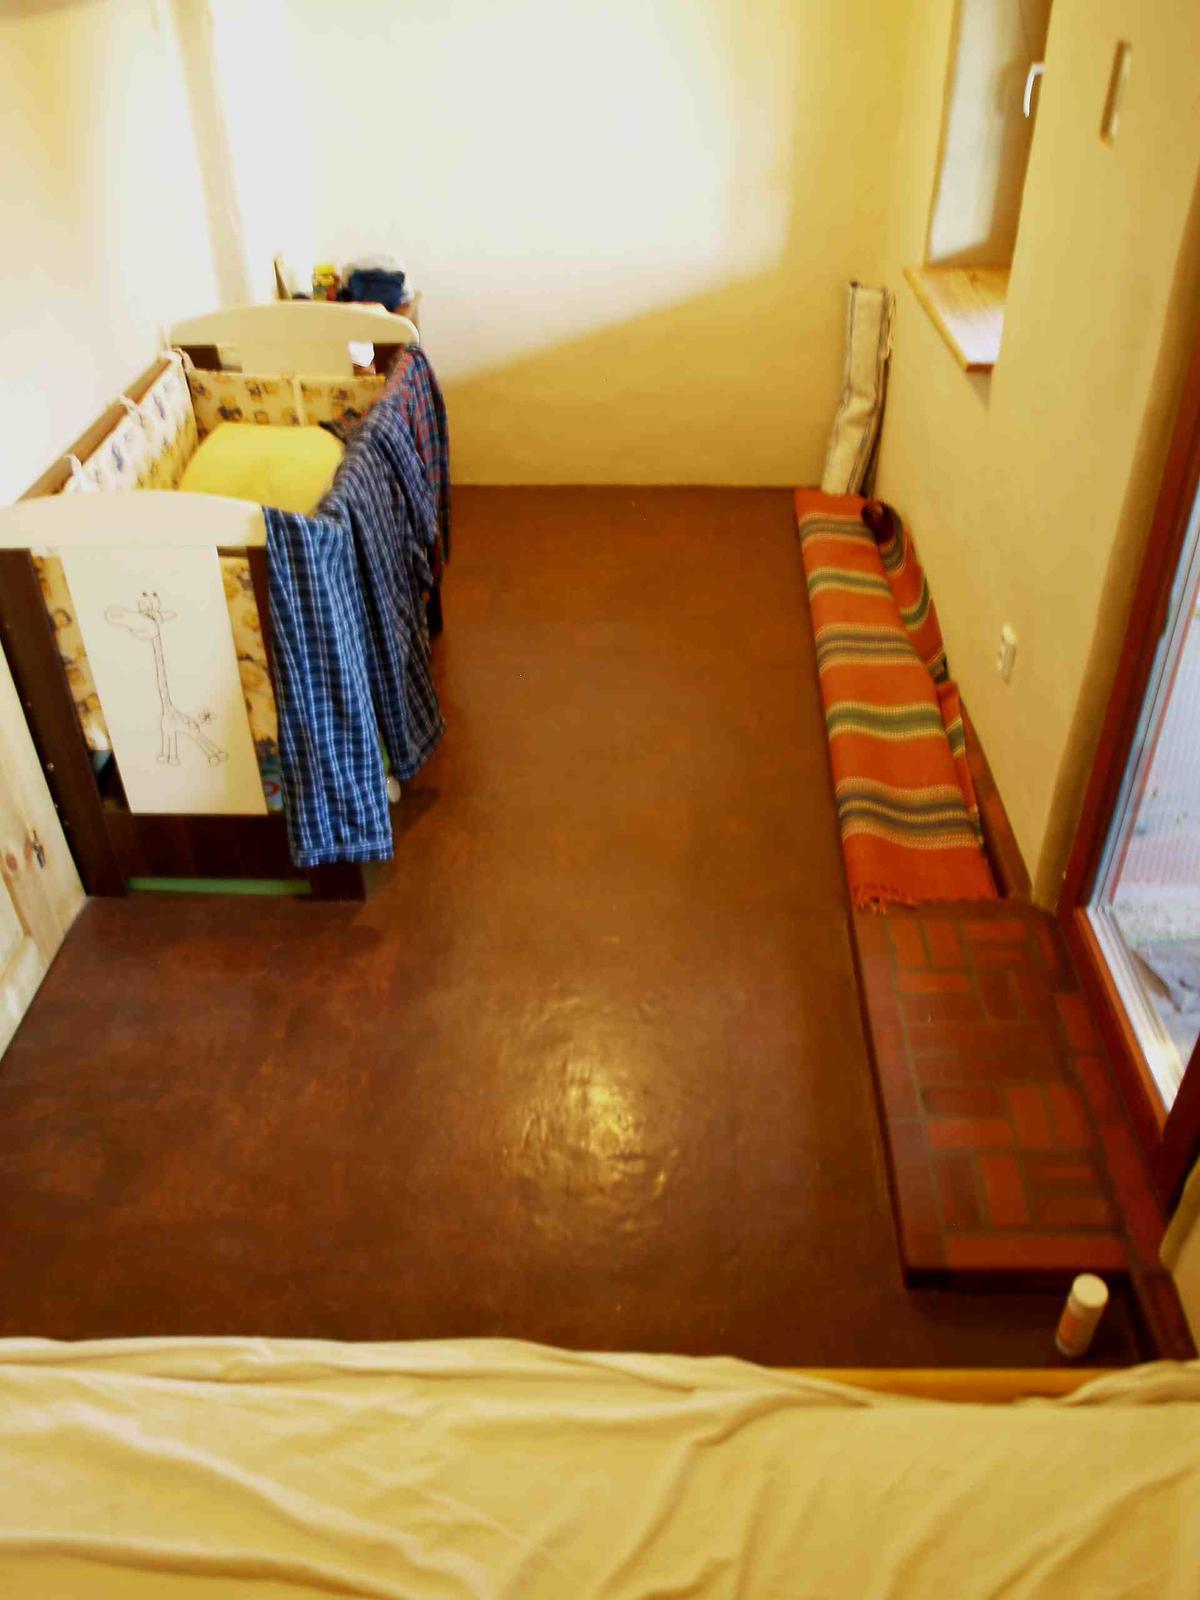 Hlinené omietky a podlahy svojpomocne. - Hotová detská izba s hlinenou podlahou.